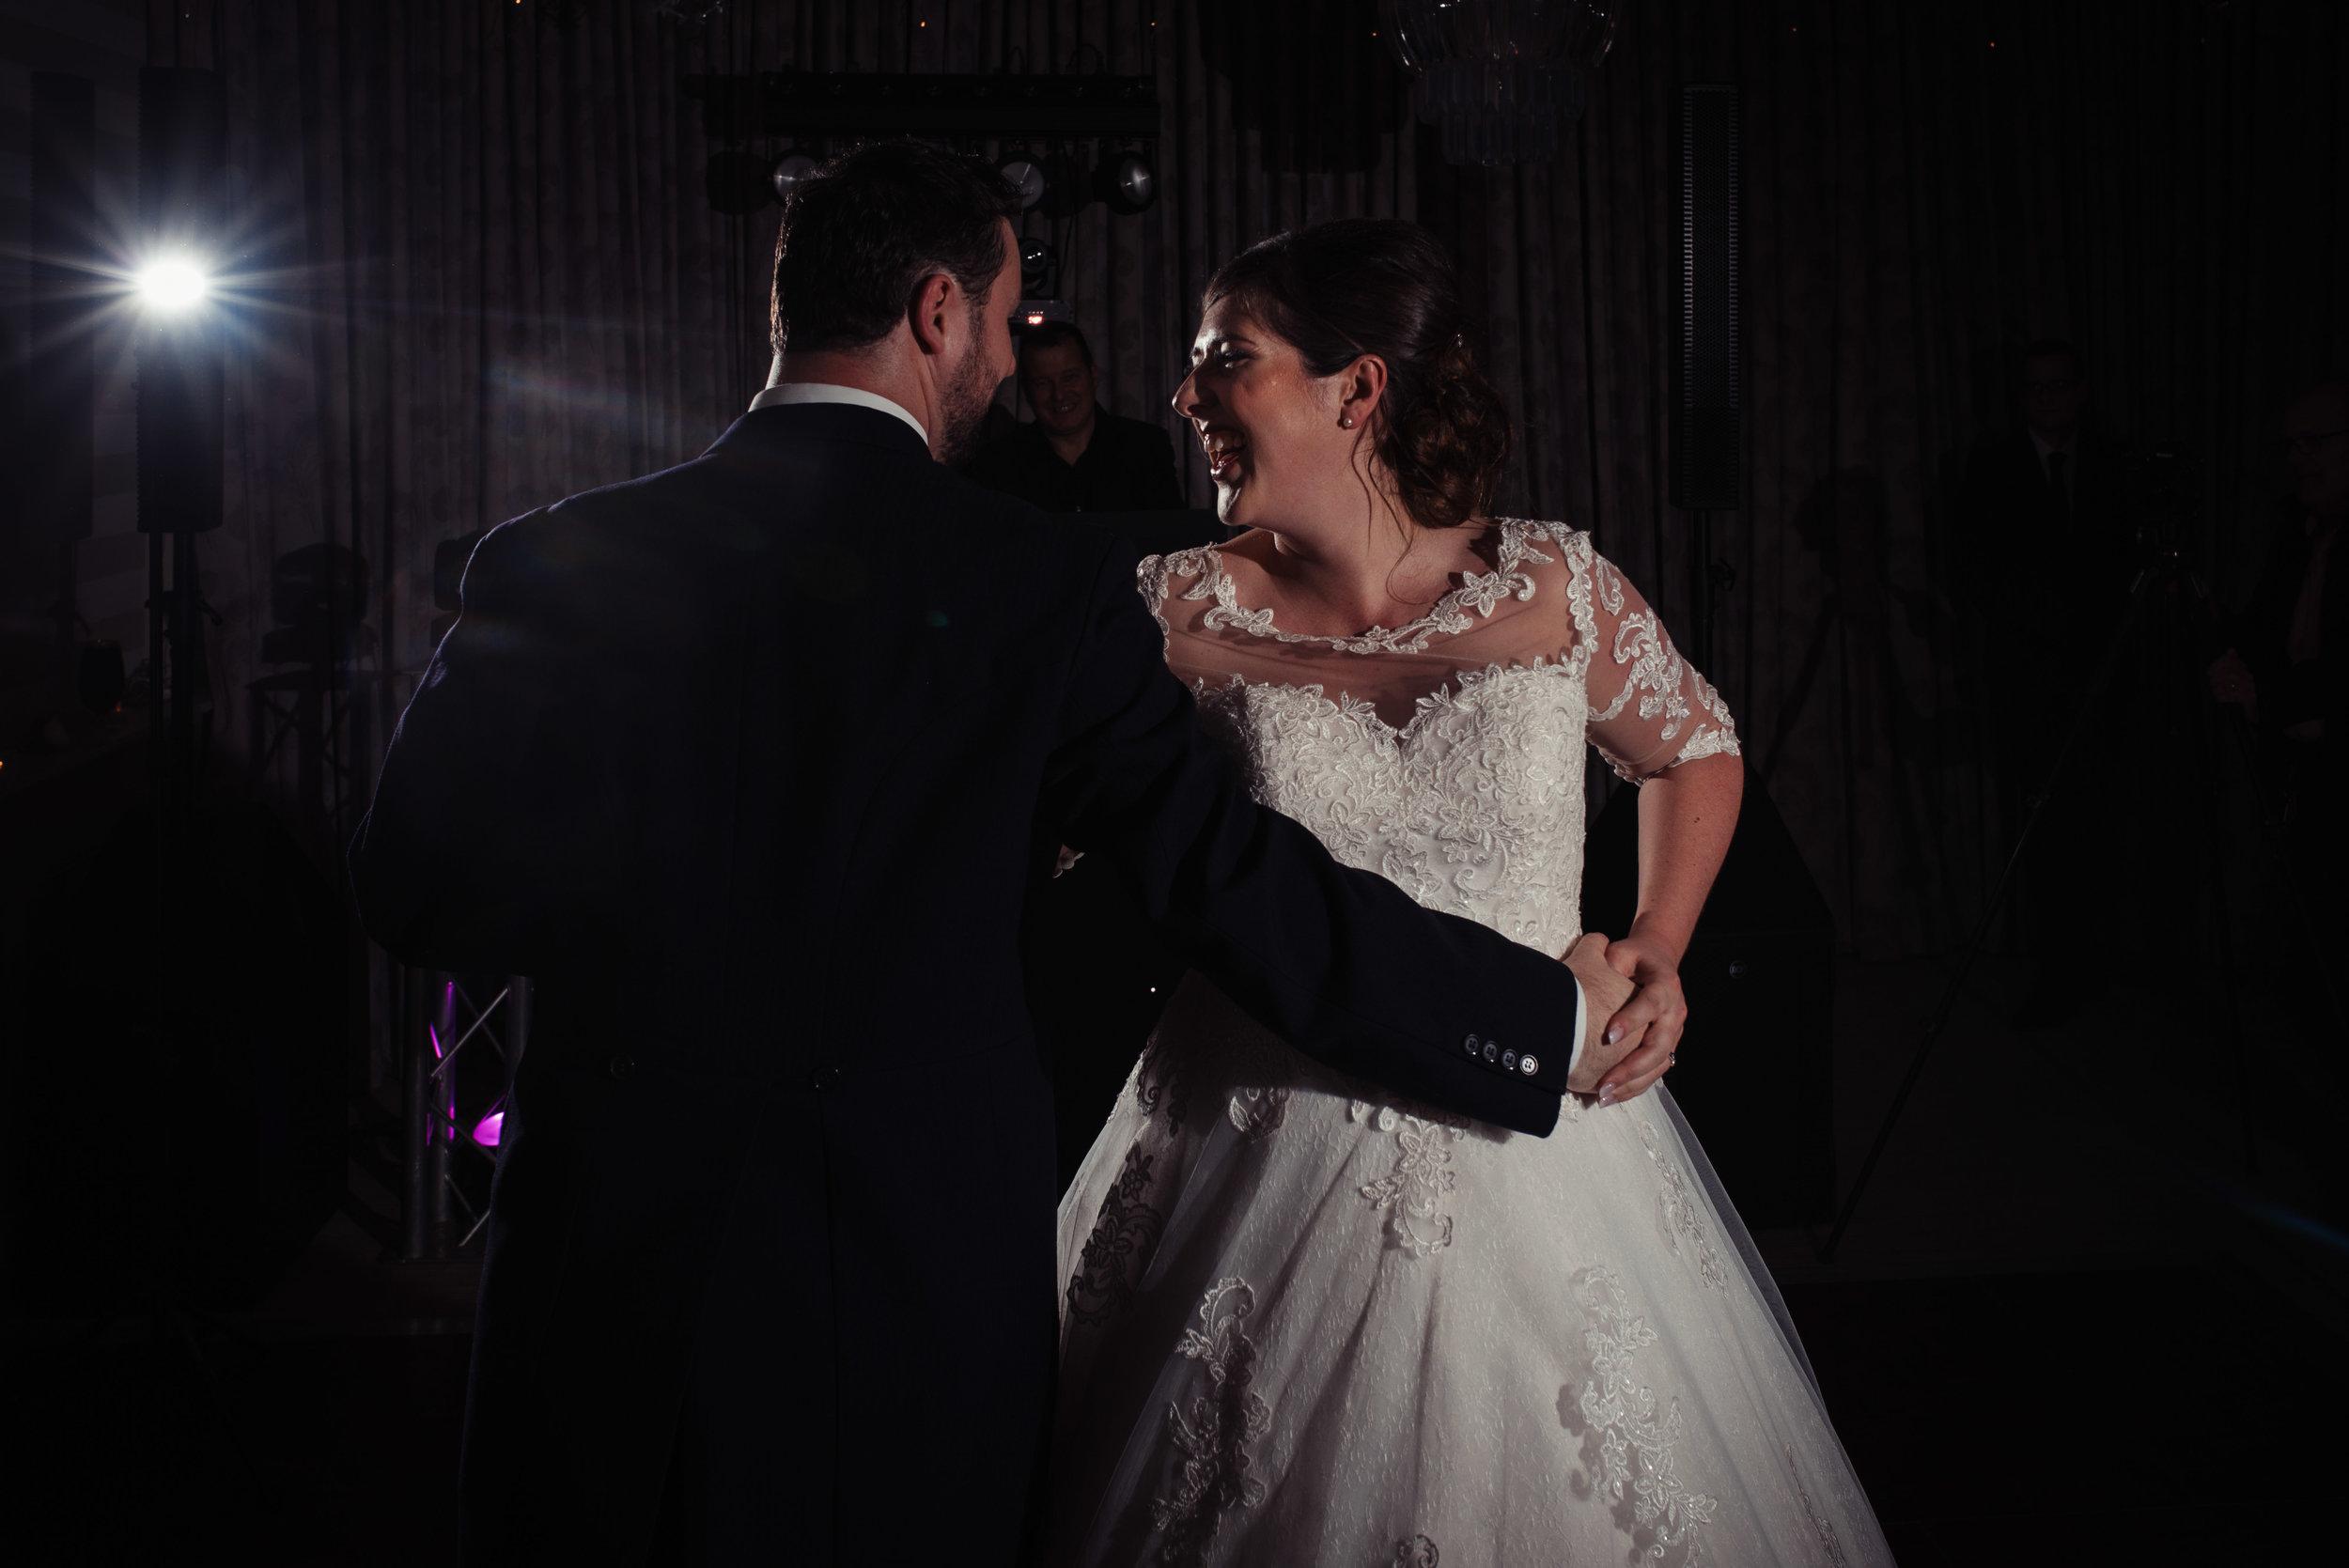 Belsfield-wedding-photography-53.jpg